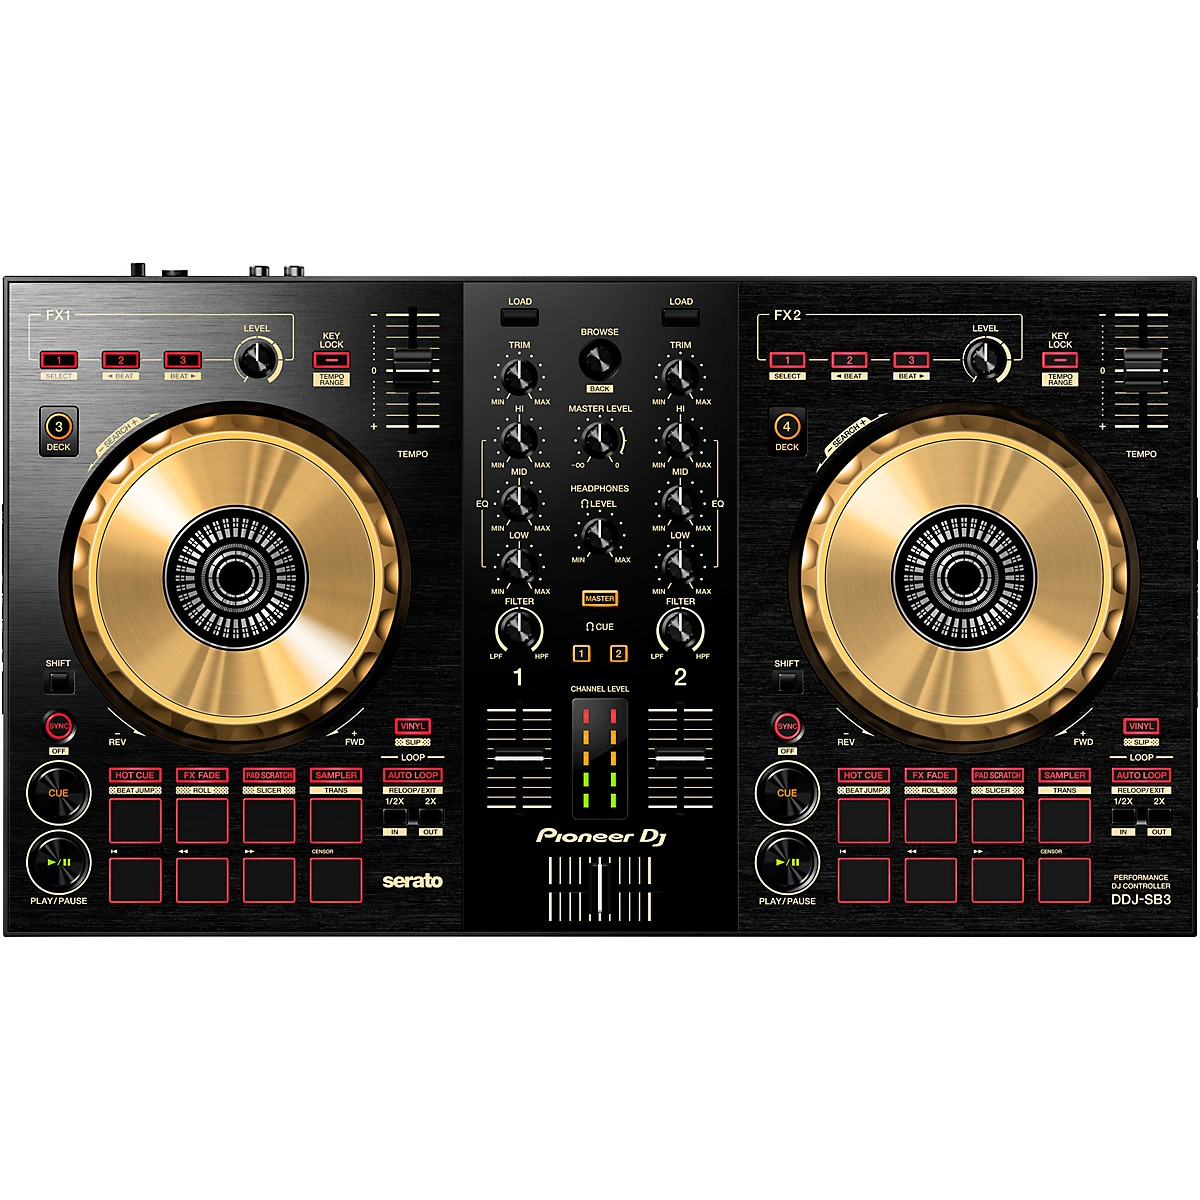 Pioneer DDJ-SB3-N Limited Edition Gold Serato DJ Controller With Pad Scratch